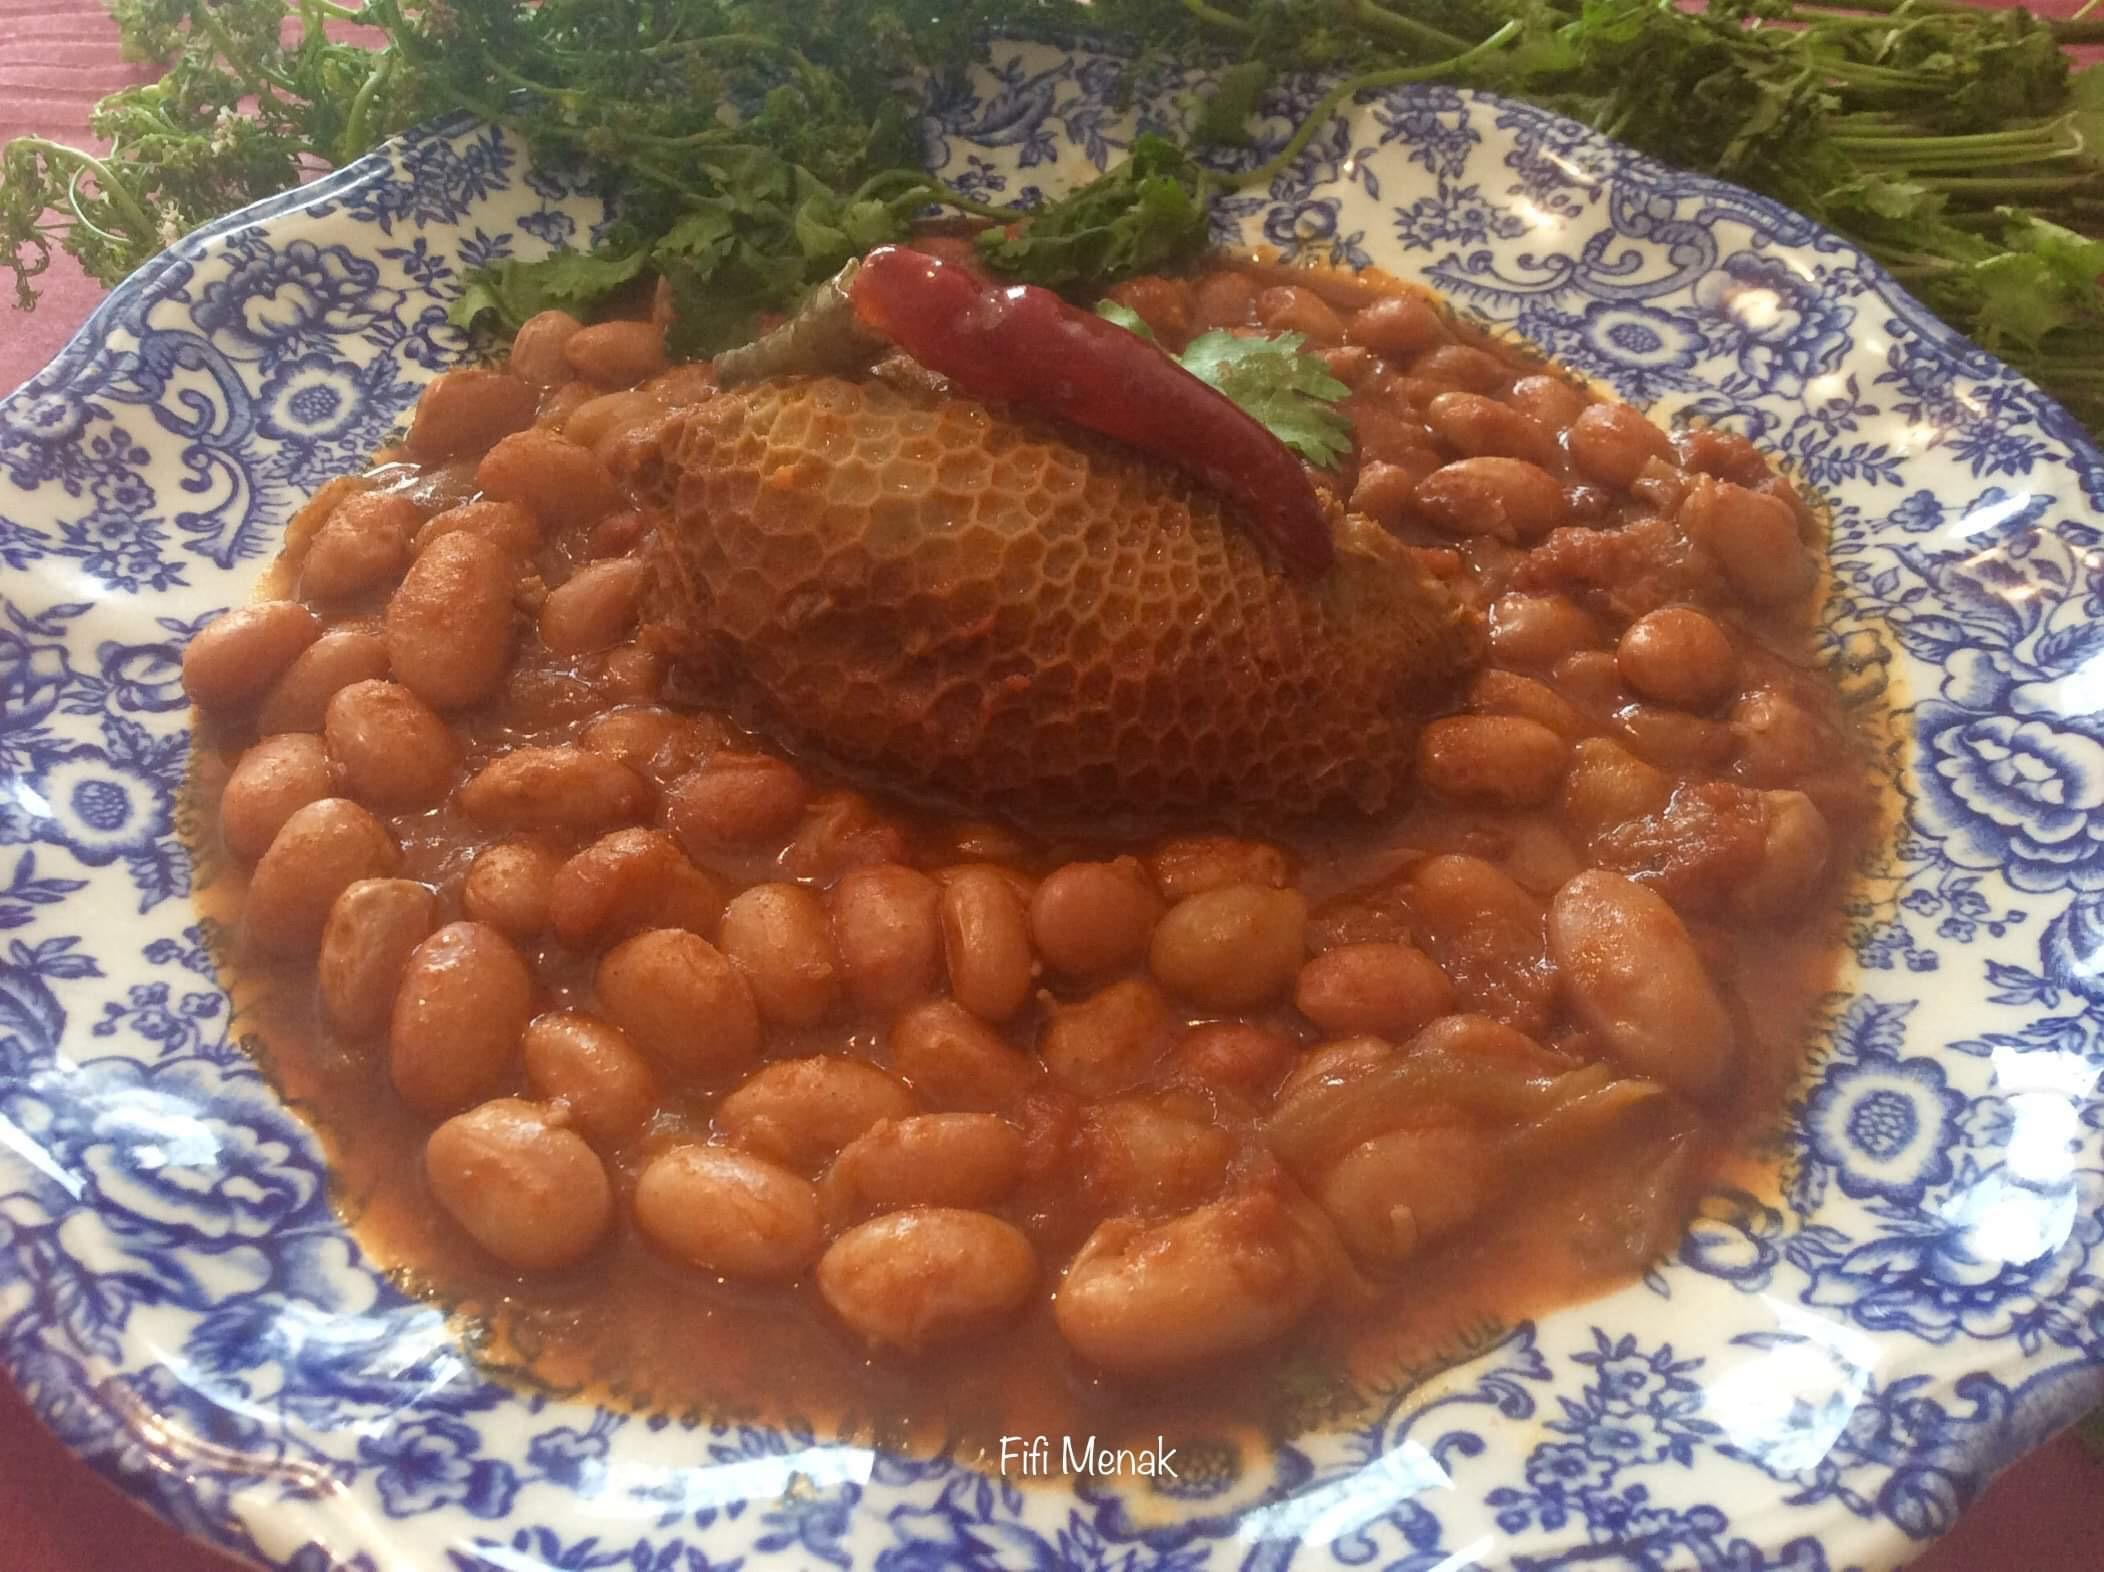 Haricots à écosser en sauce avec la panse farcie (Loubia fessassa b'osbane dewara)